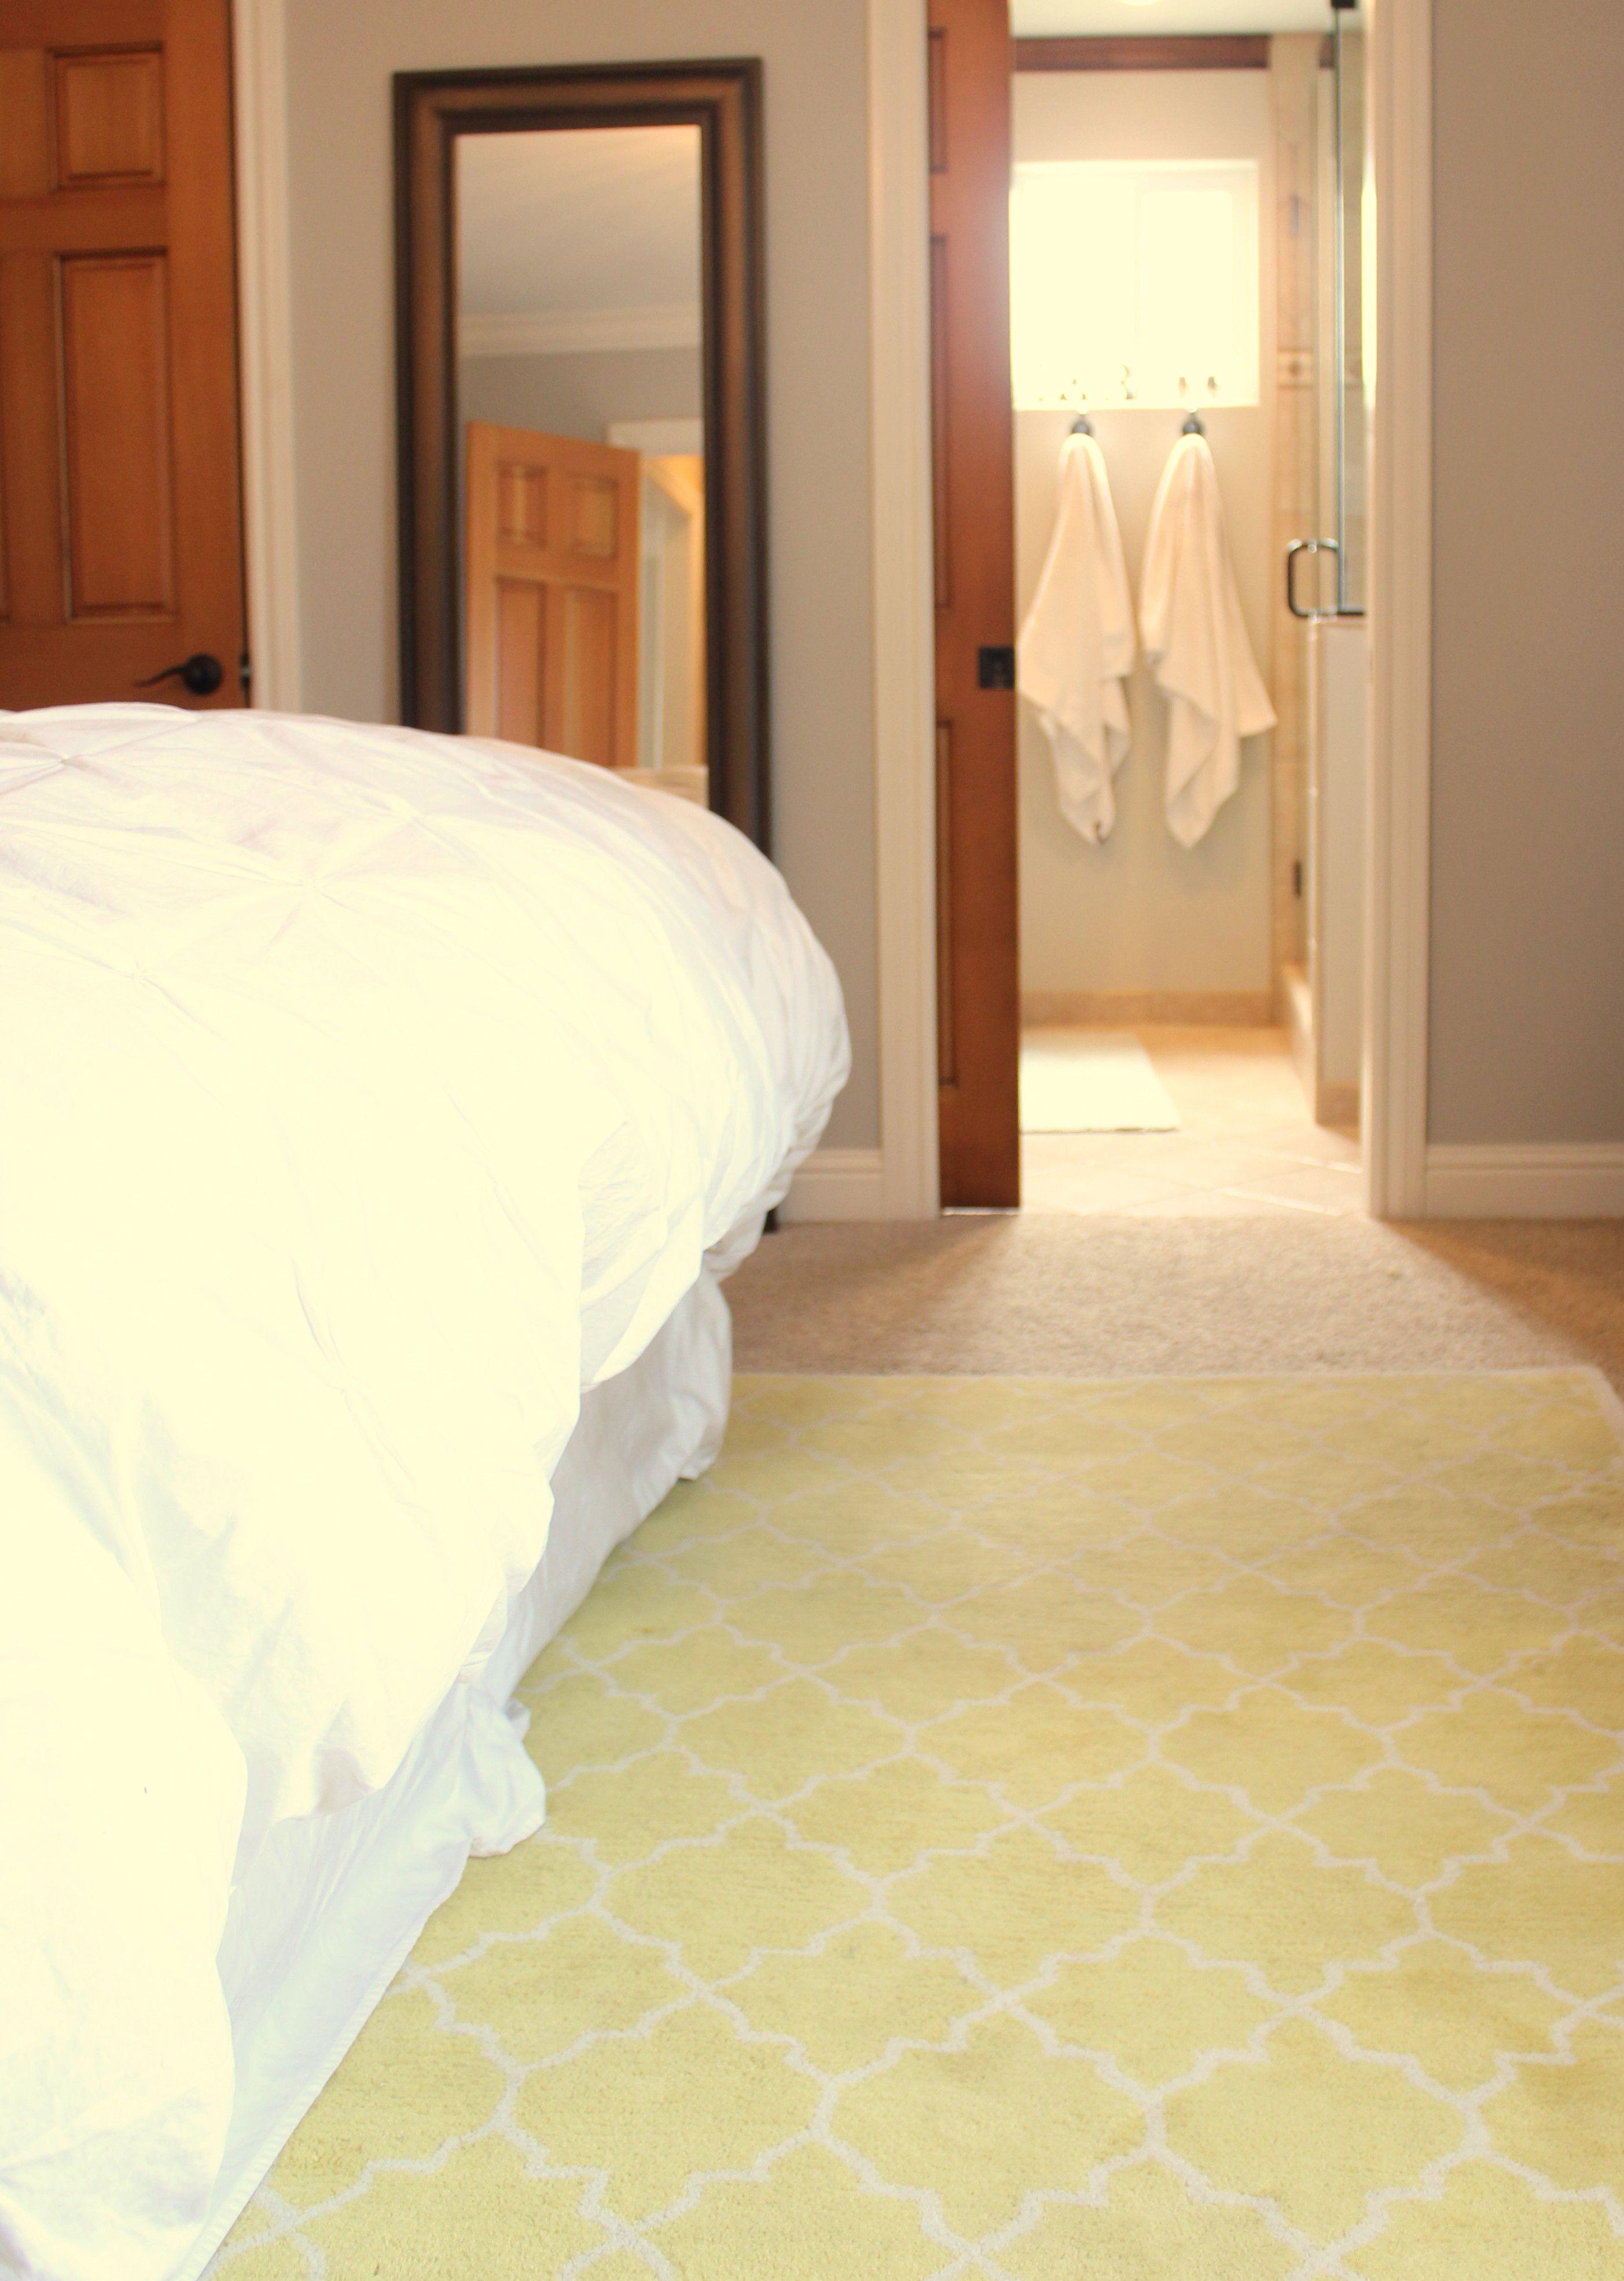 area rug on carpet. so cozy | Decorating & Organizing | Pinterest ...